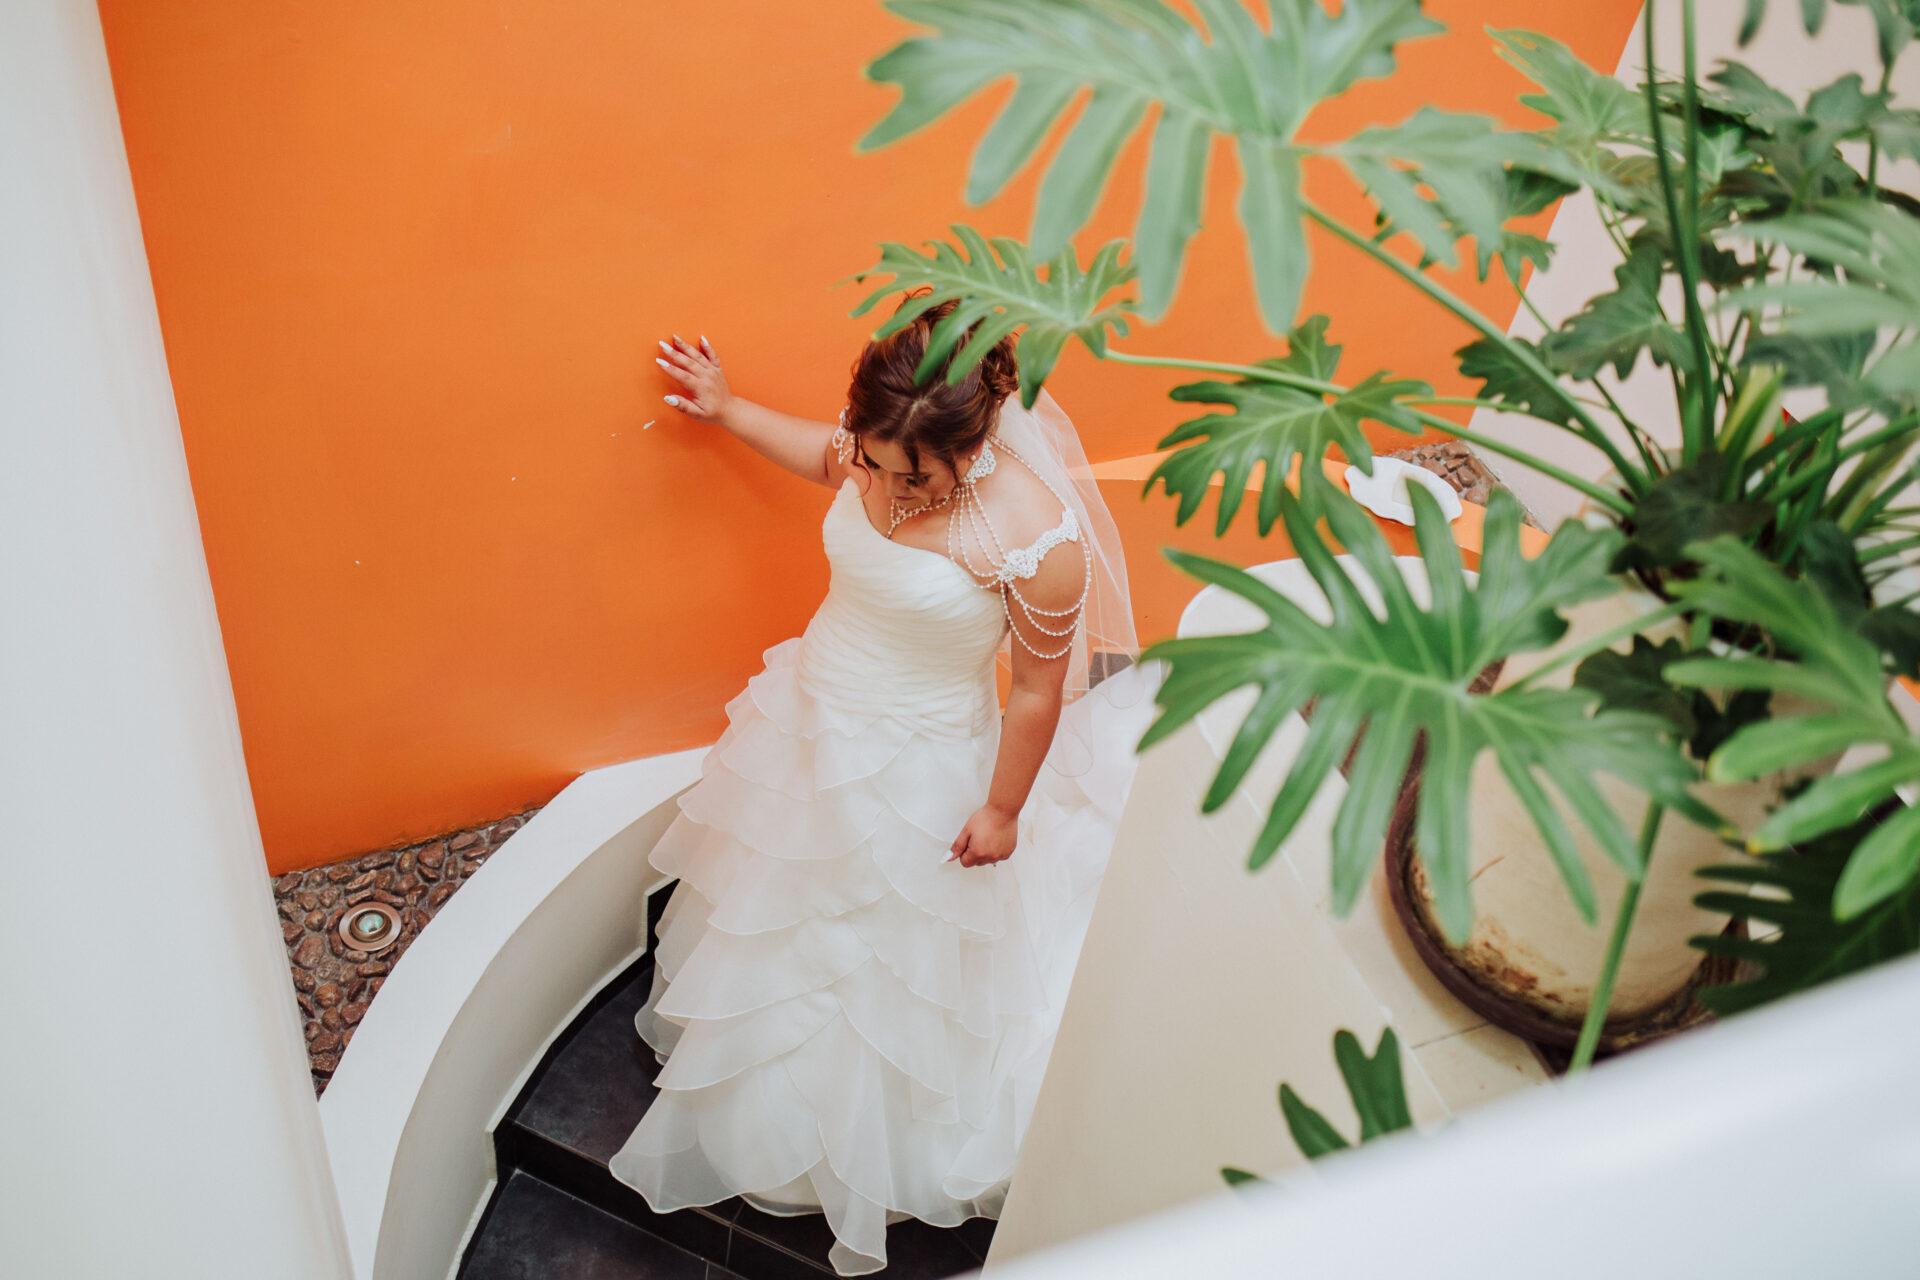 javier_noriega_fotografo_bodas_gaviones_zacatecas_wedding_photographer7